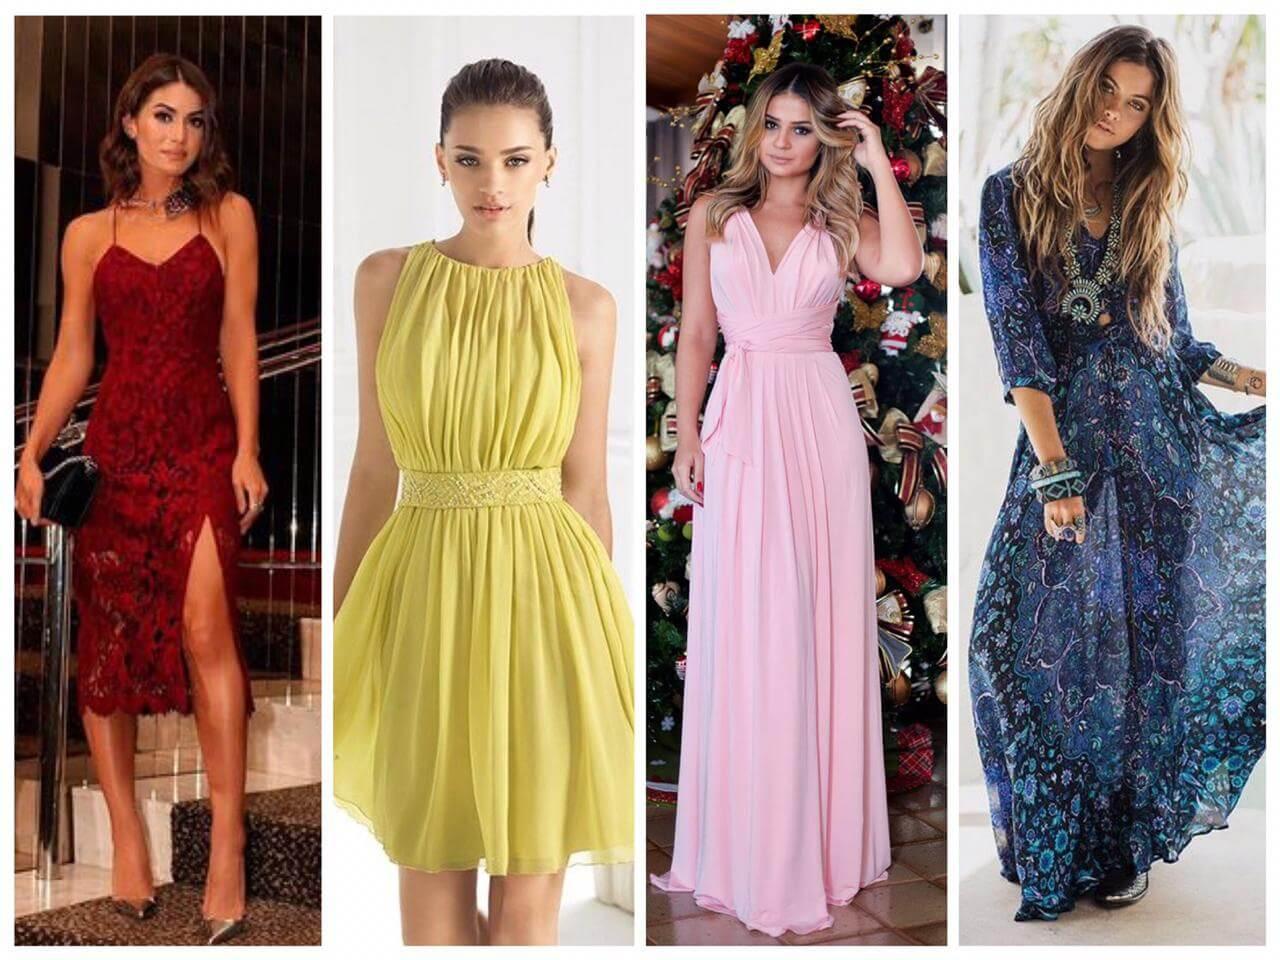 Looks de Reveillon - Cores e estilos de looks e lingeries para o Ano Novo